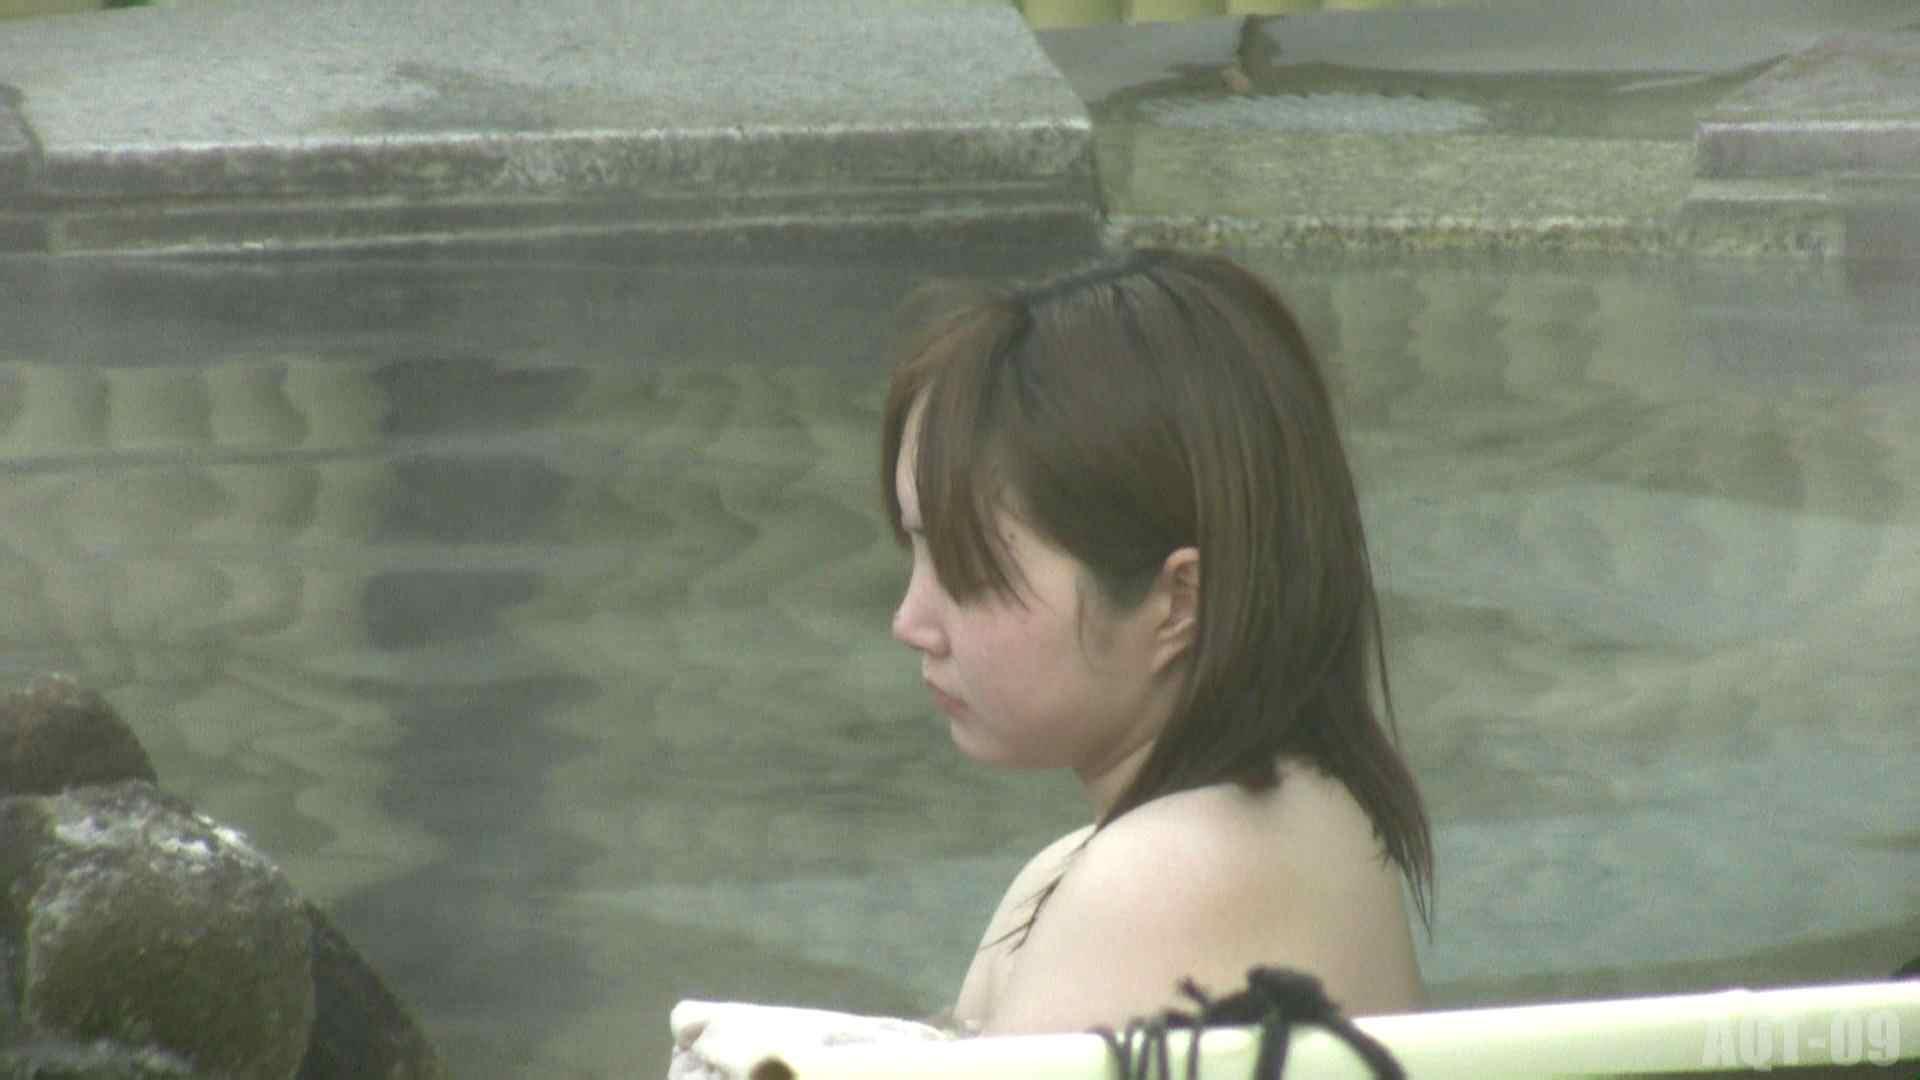 Aquaな露天風呂Vol.781 0  48連発 20